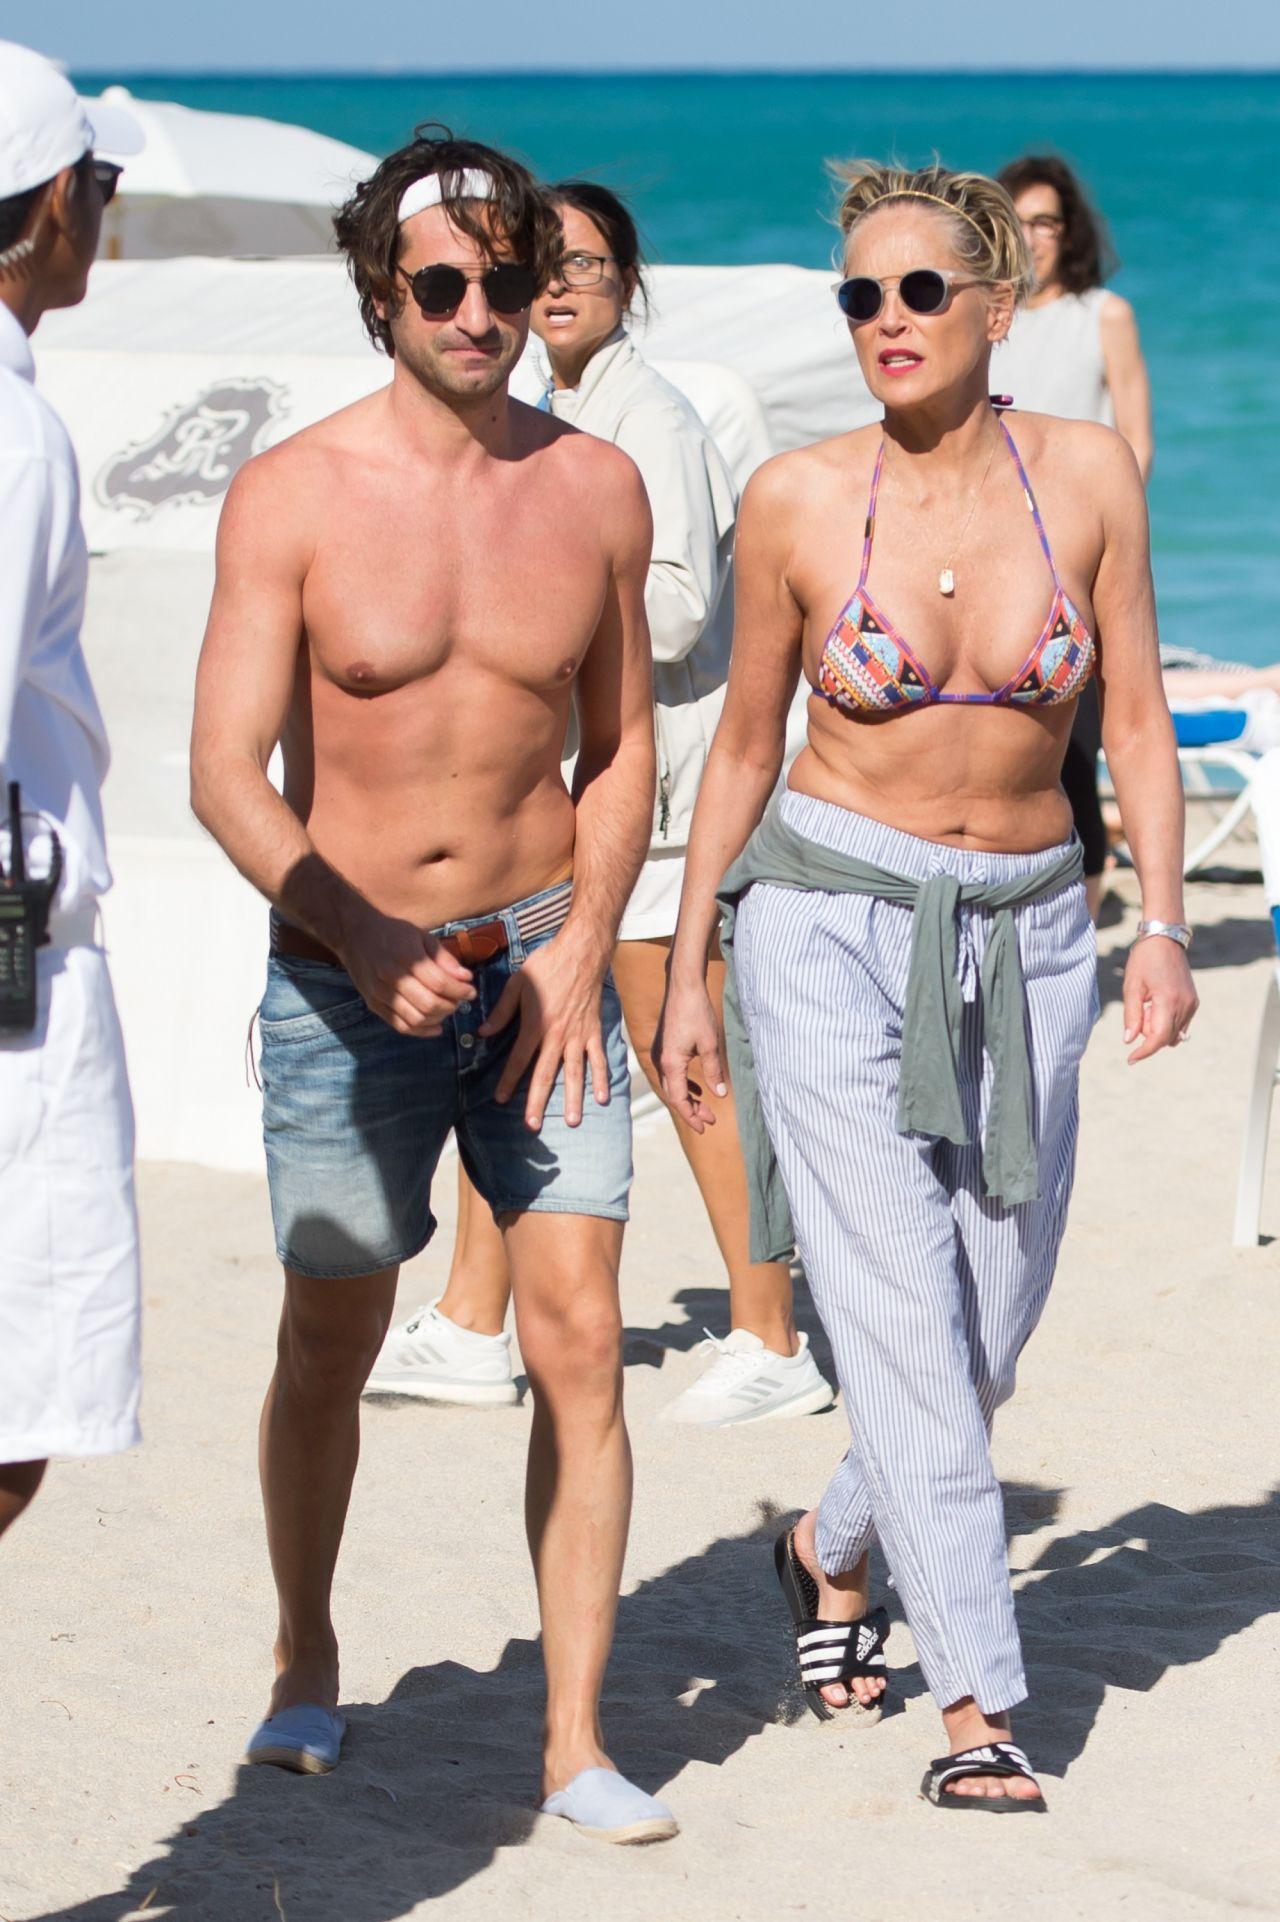 Sharon Stone In Bikini Top At The Beach In Miami With Her